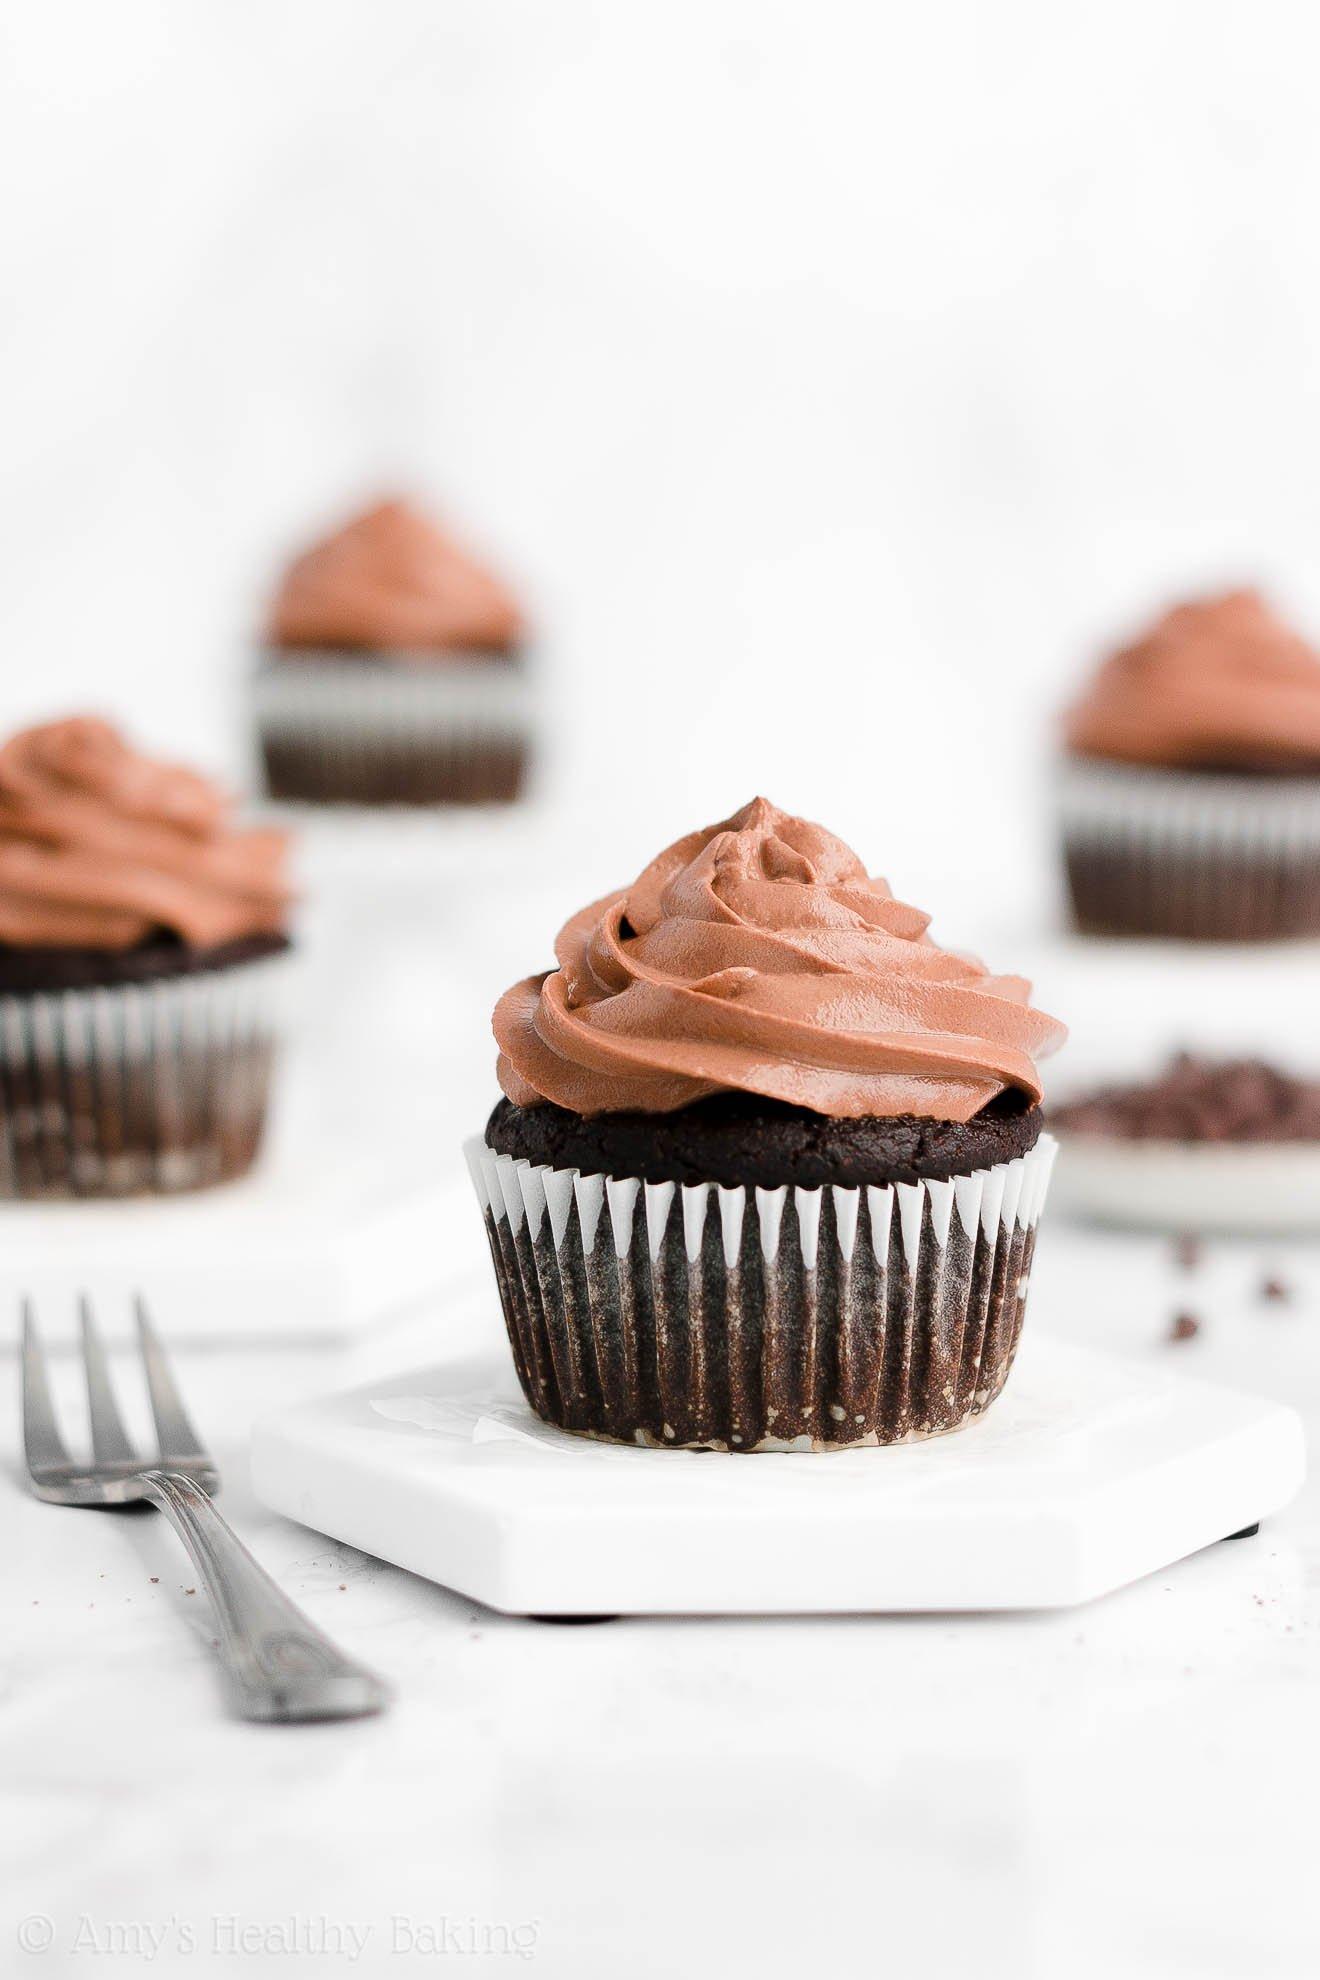 Best Easy Healthy Homemade Super Moist One-Bowl Dark Chocolate Cupcakes